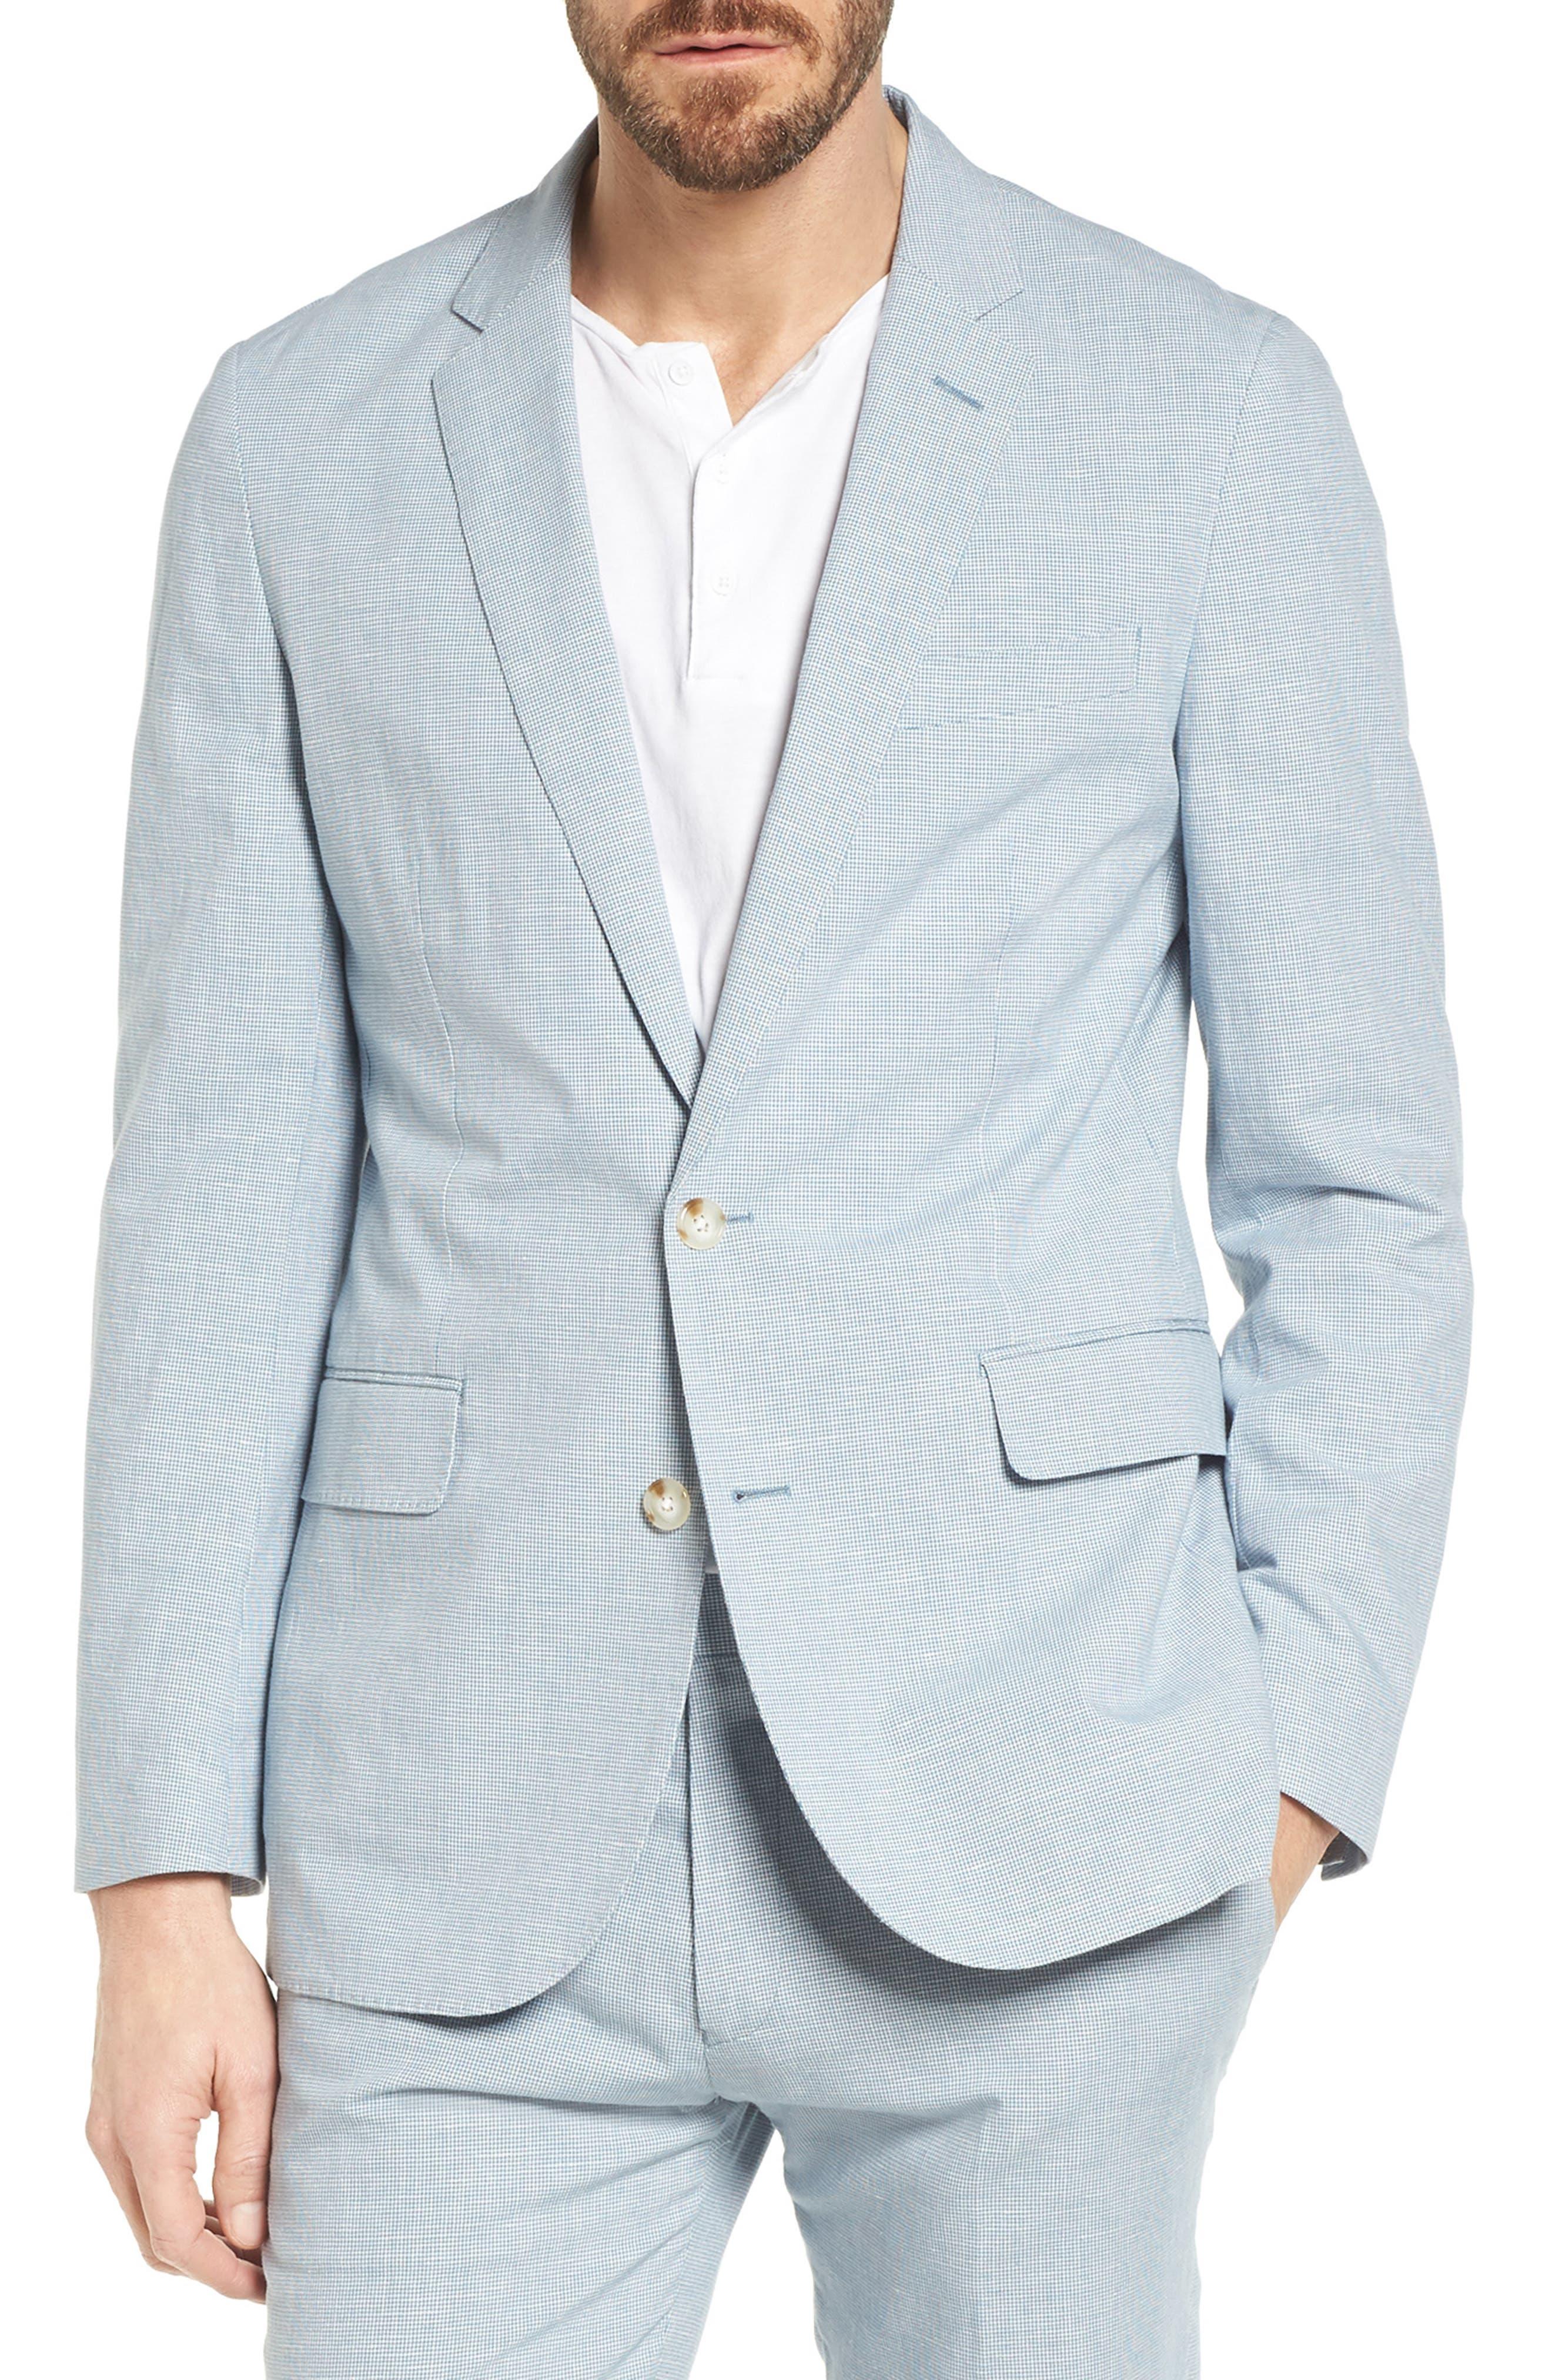 Ludlow Houndstooth Cotton & Linen Sport Coat,                             Main thumbnail 1, color,                             Light Blue